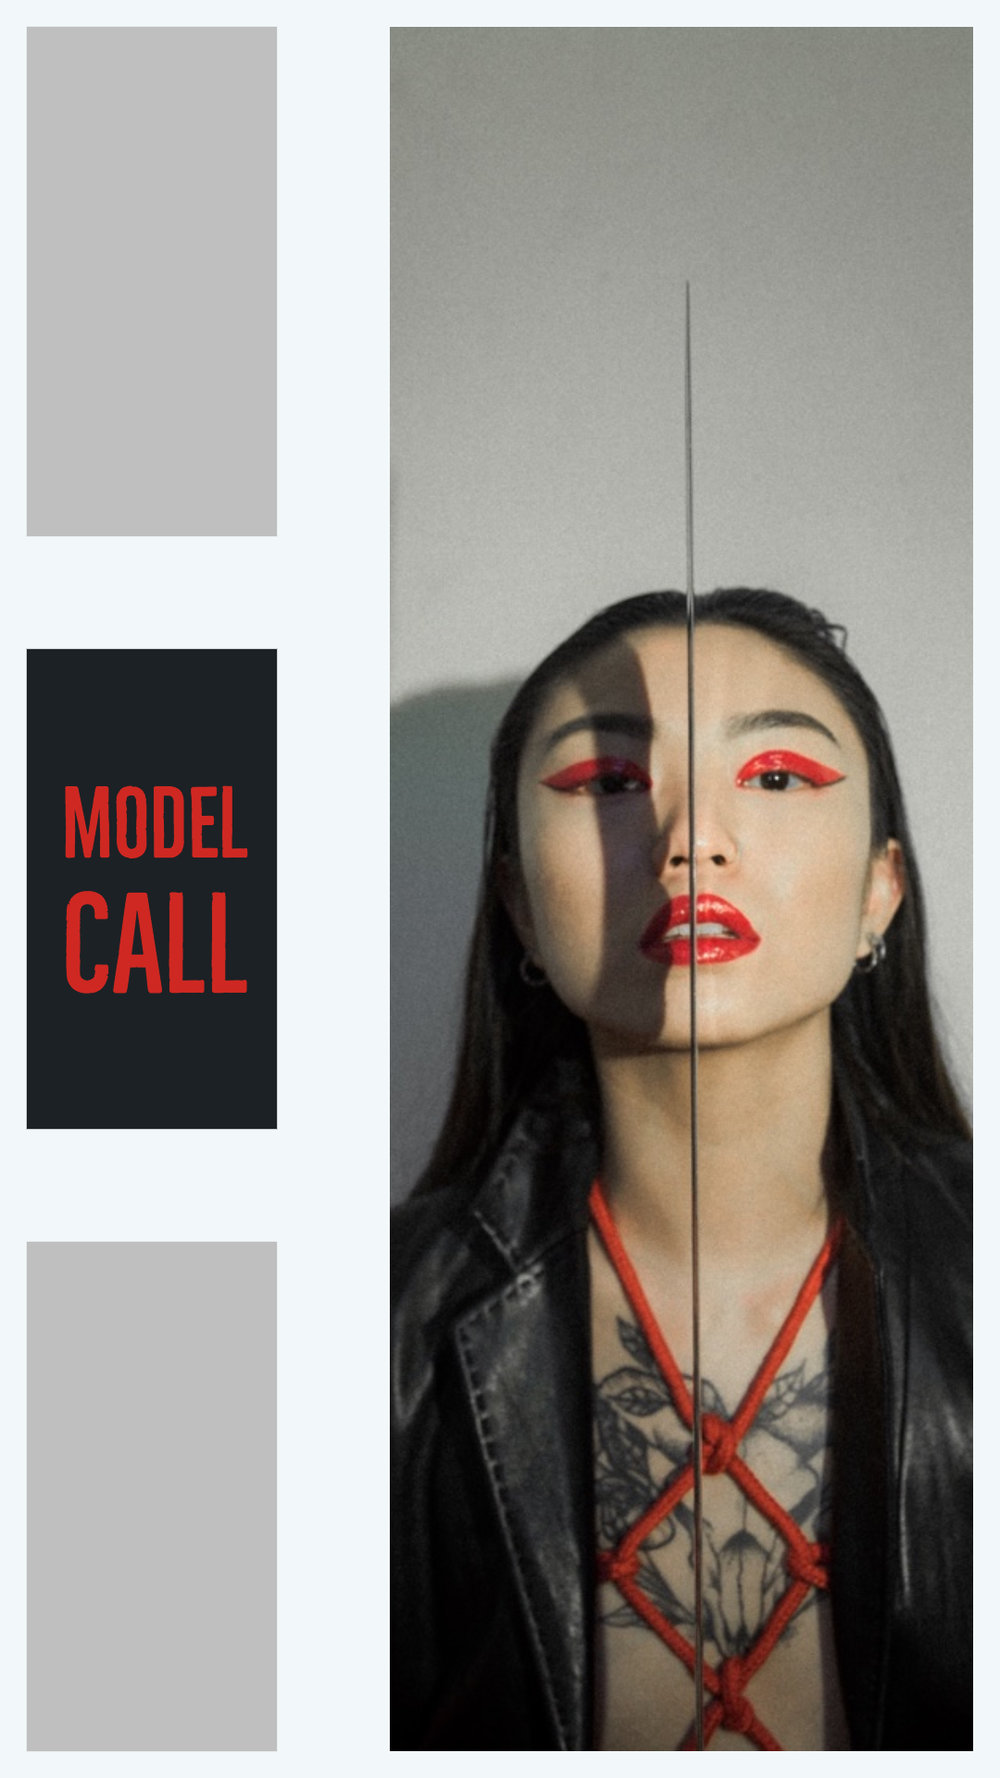 modelcall.jpg